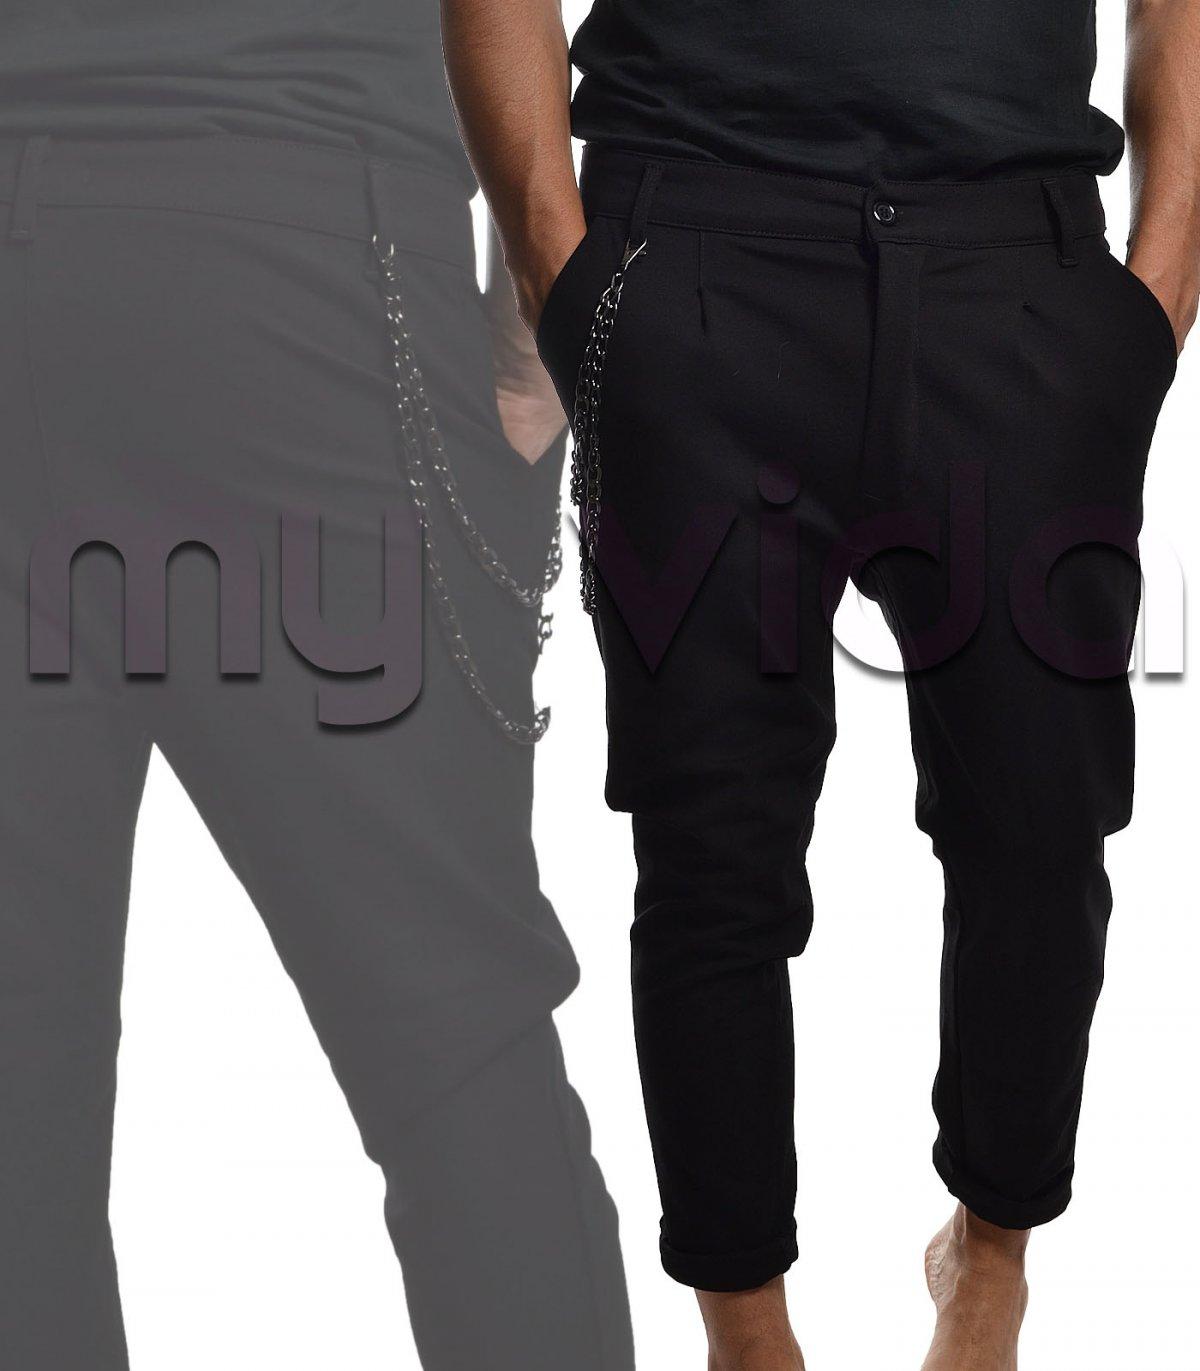 bc46d97a250211 Pantaloni uomo catena pence | My Vida